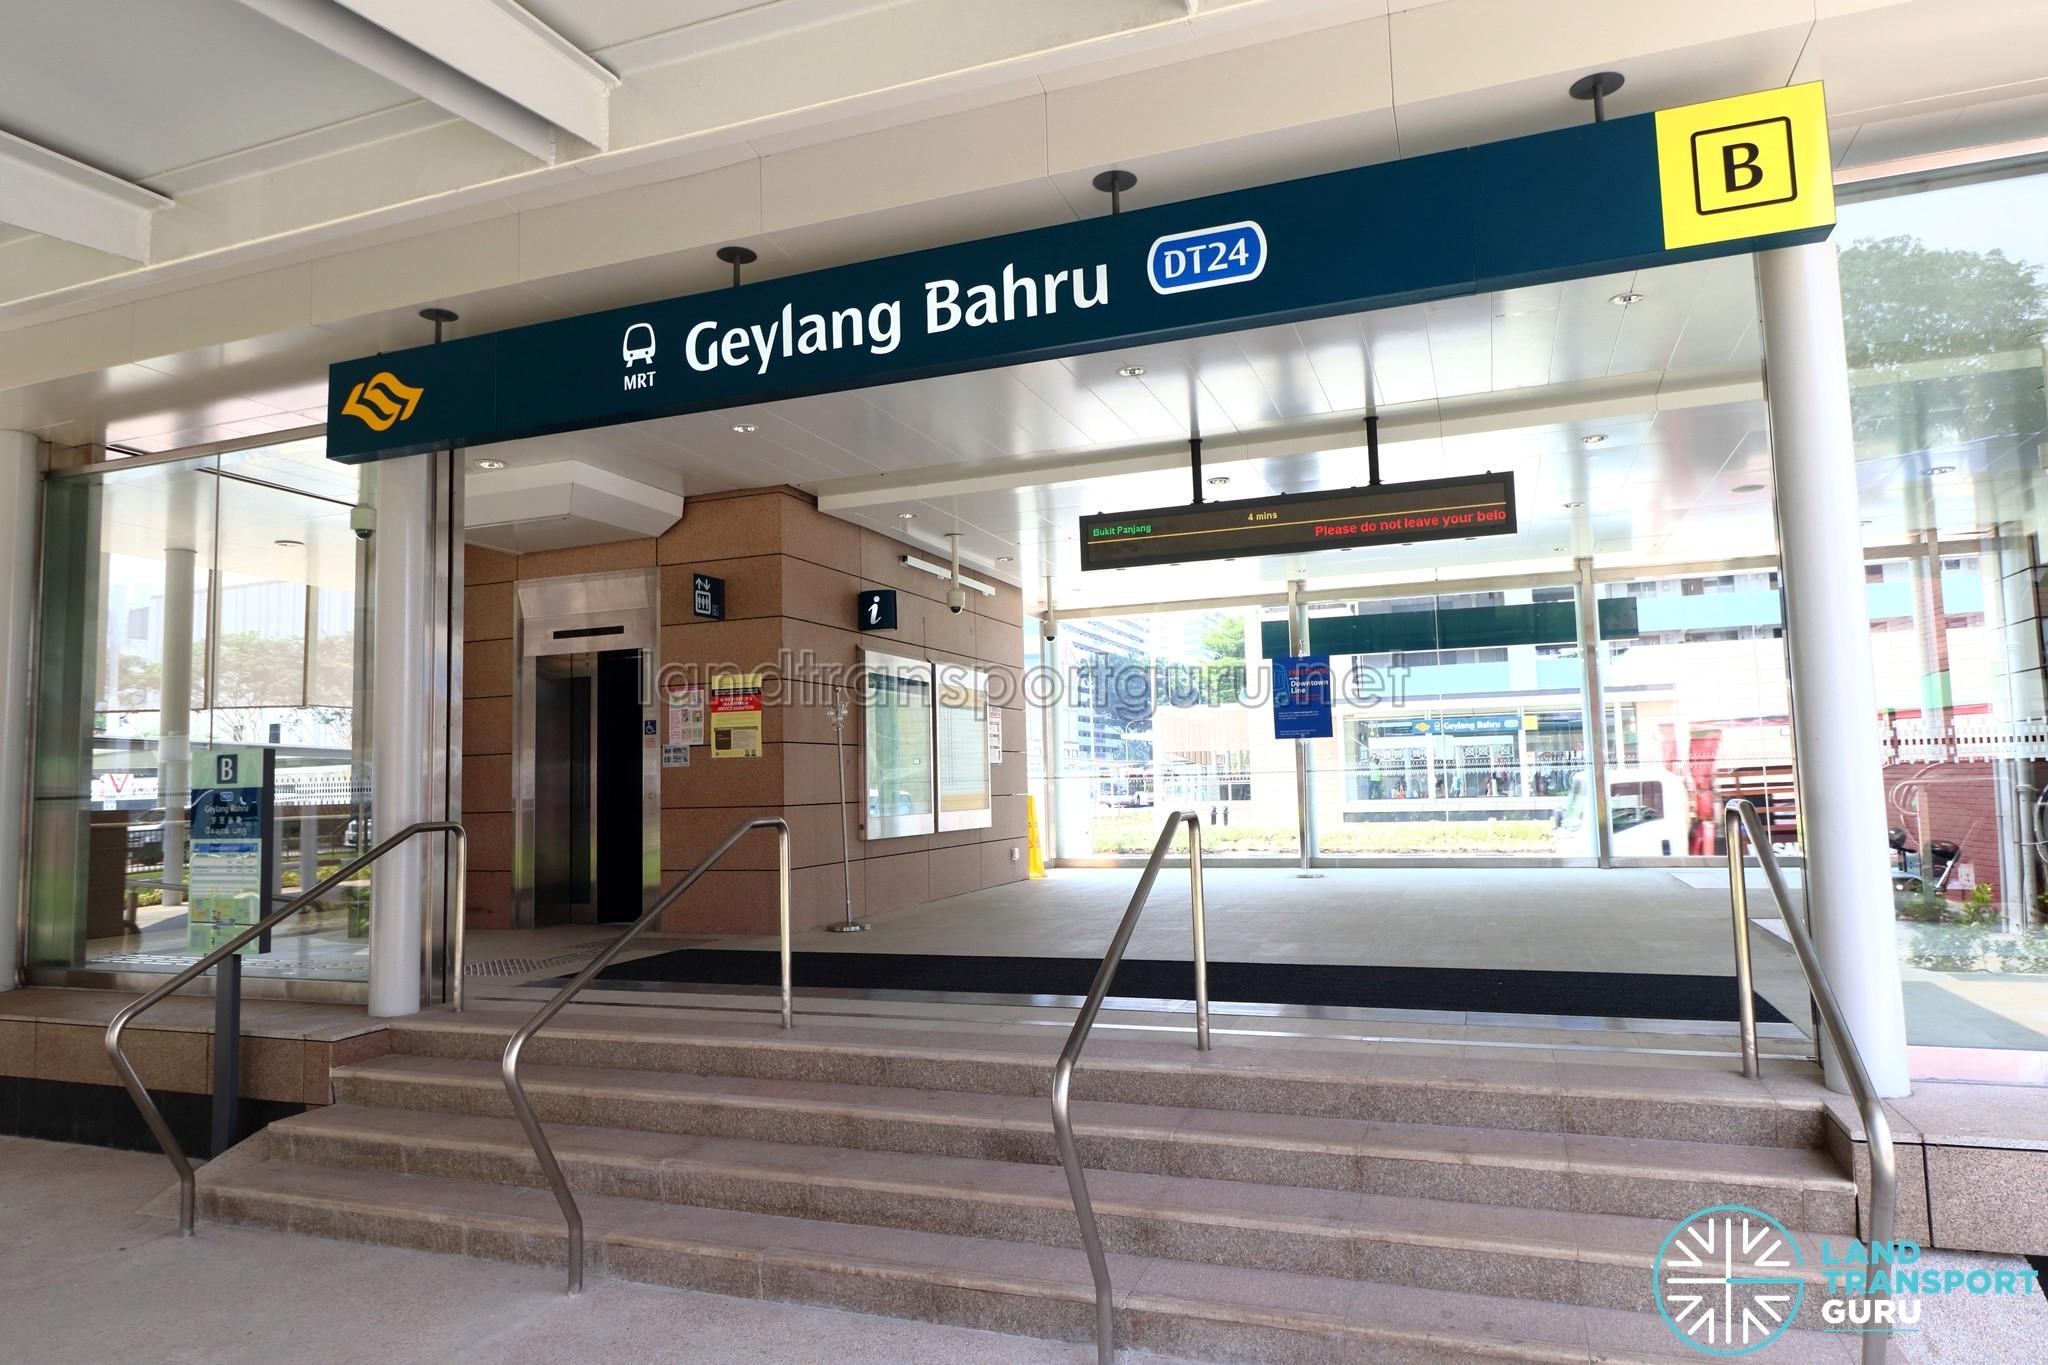 Geylang Bahru MRT Station Exit B